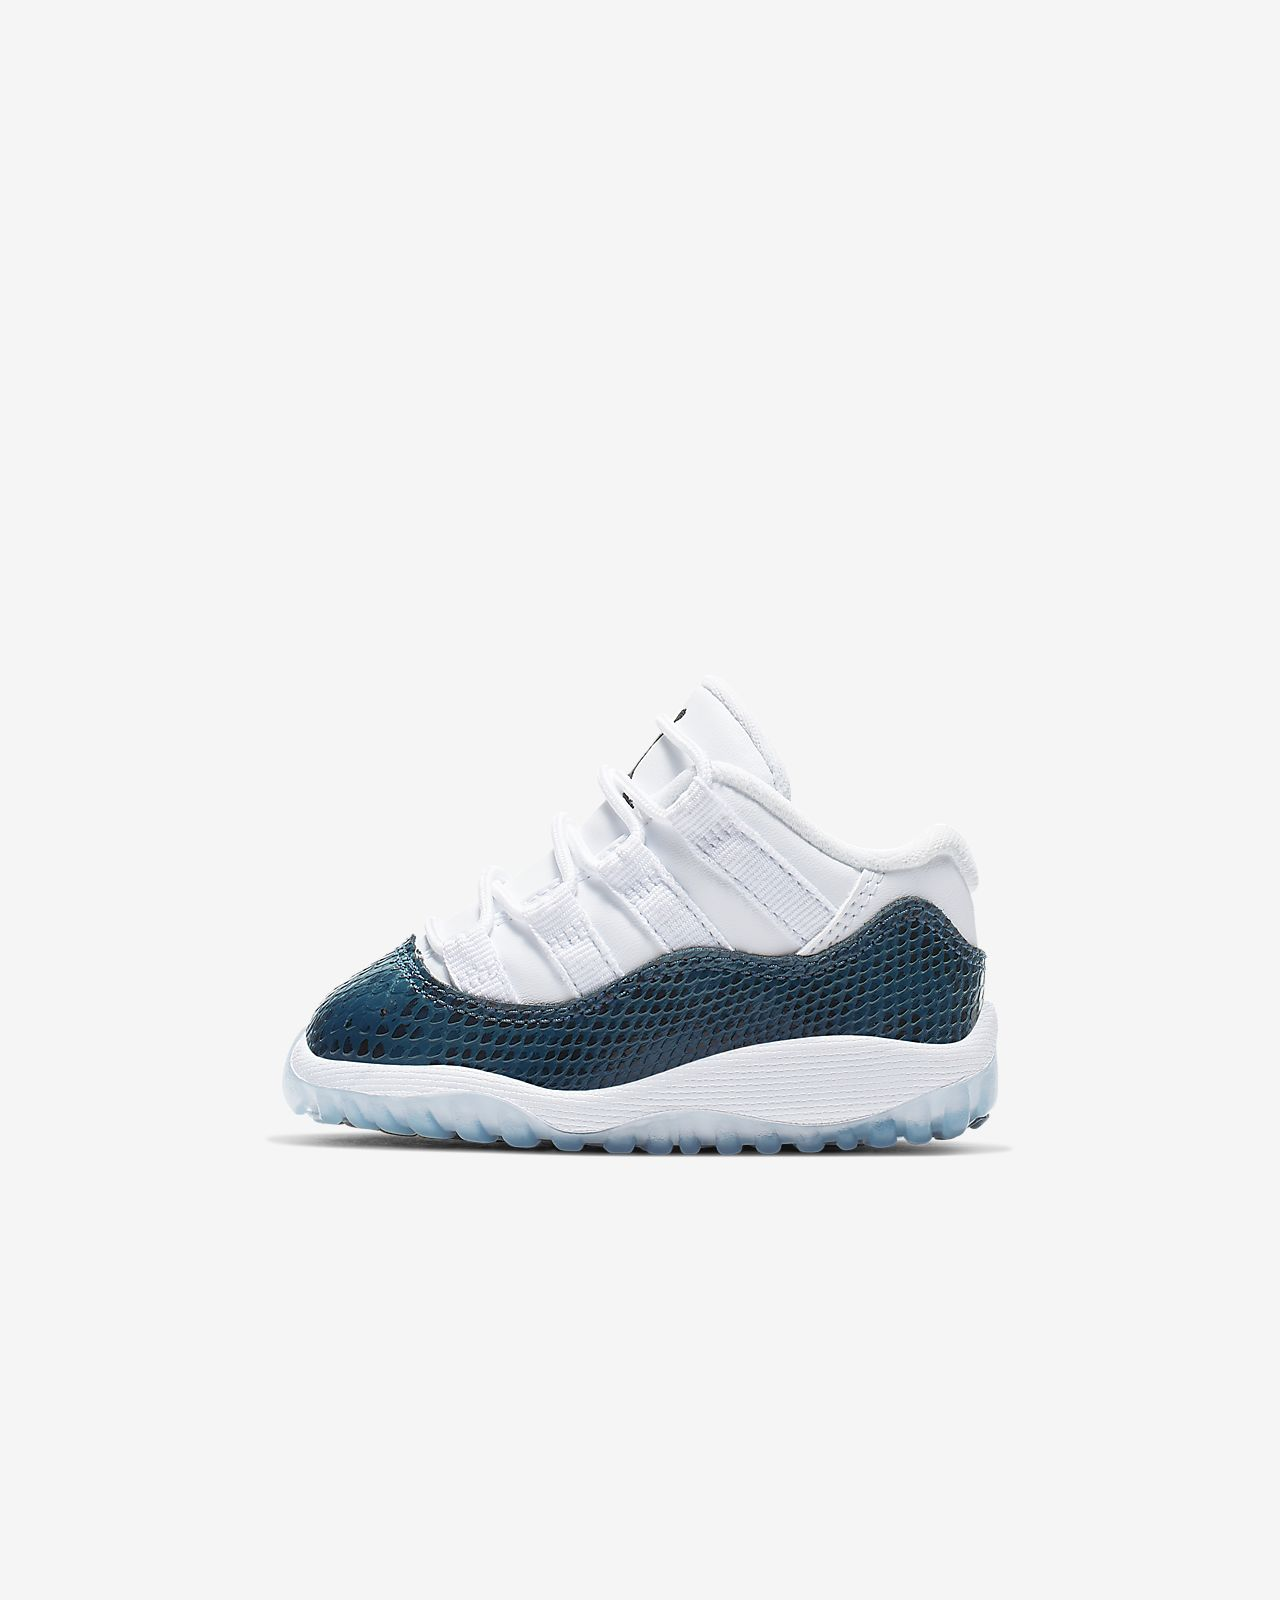 f7e76339d5af Jordan 11 Retro Low LE Baby Toddler Shoe. Nike.com AE